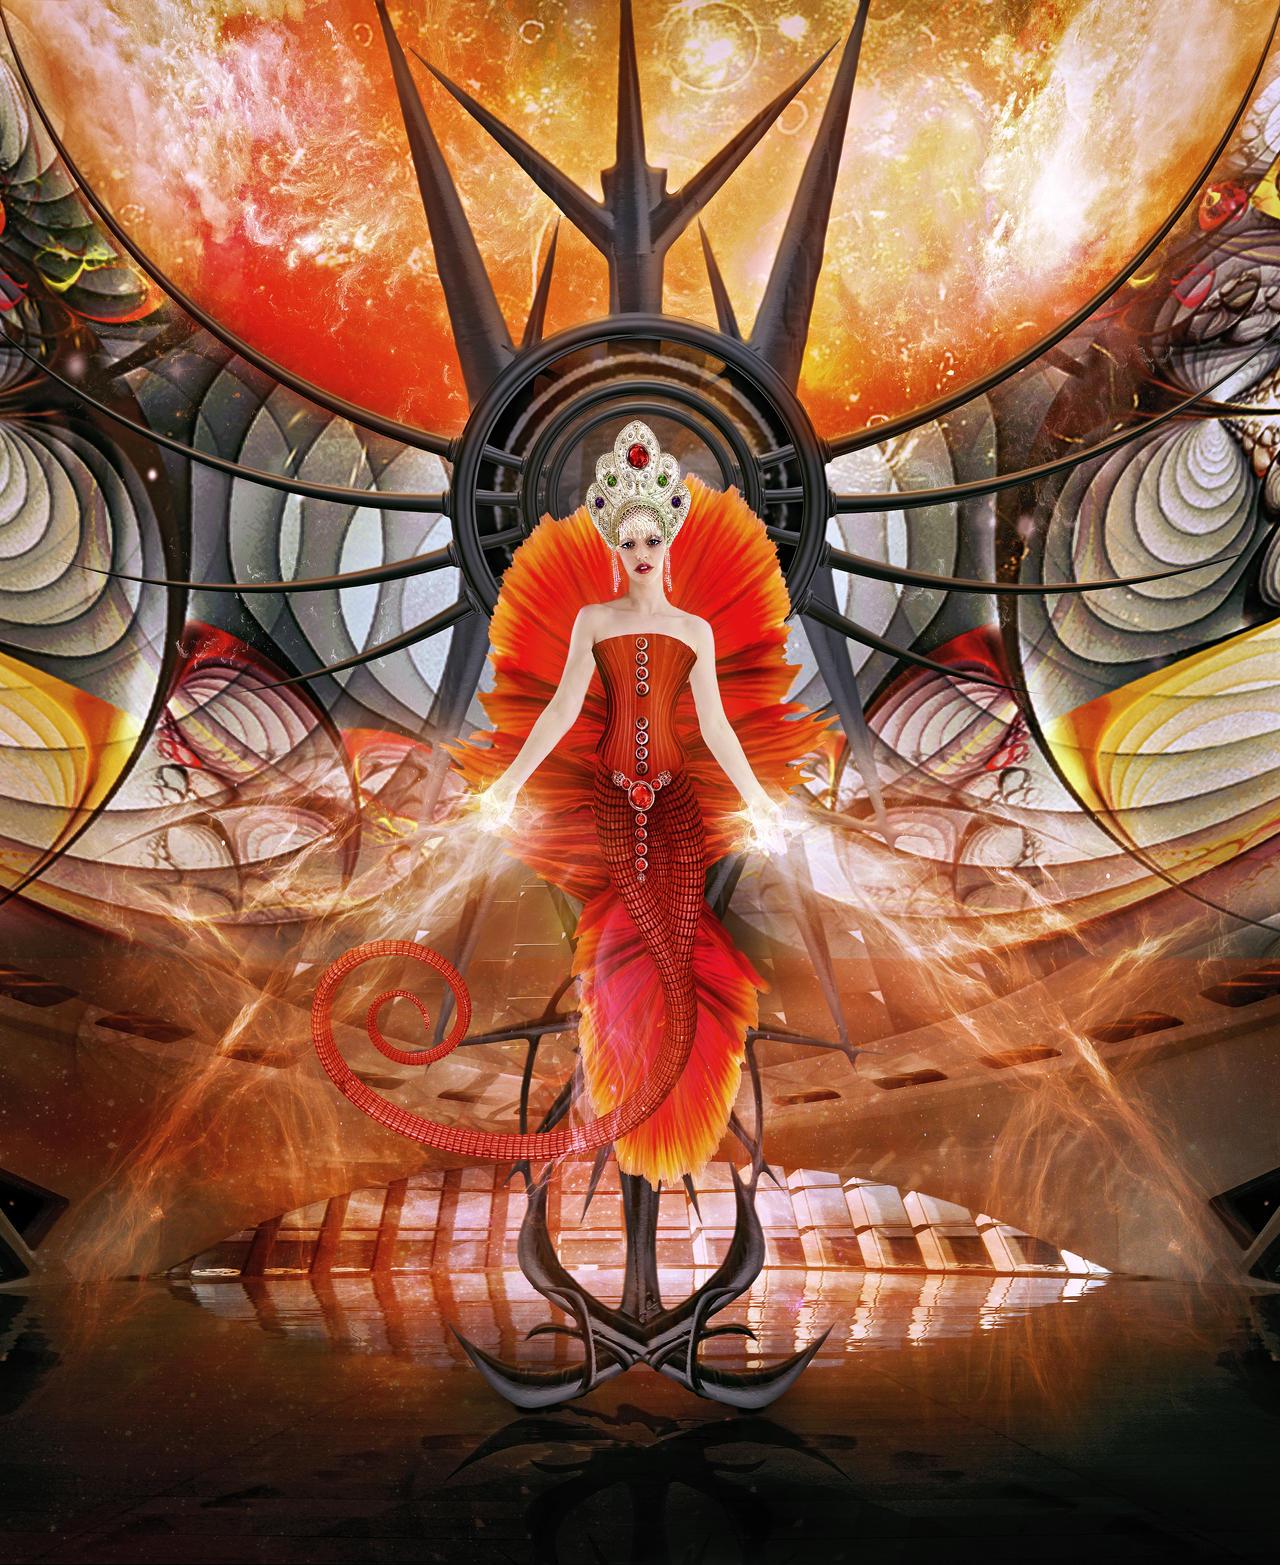 Alien Queen - Keeper of the Flame by shoutsandwhispers